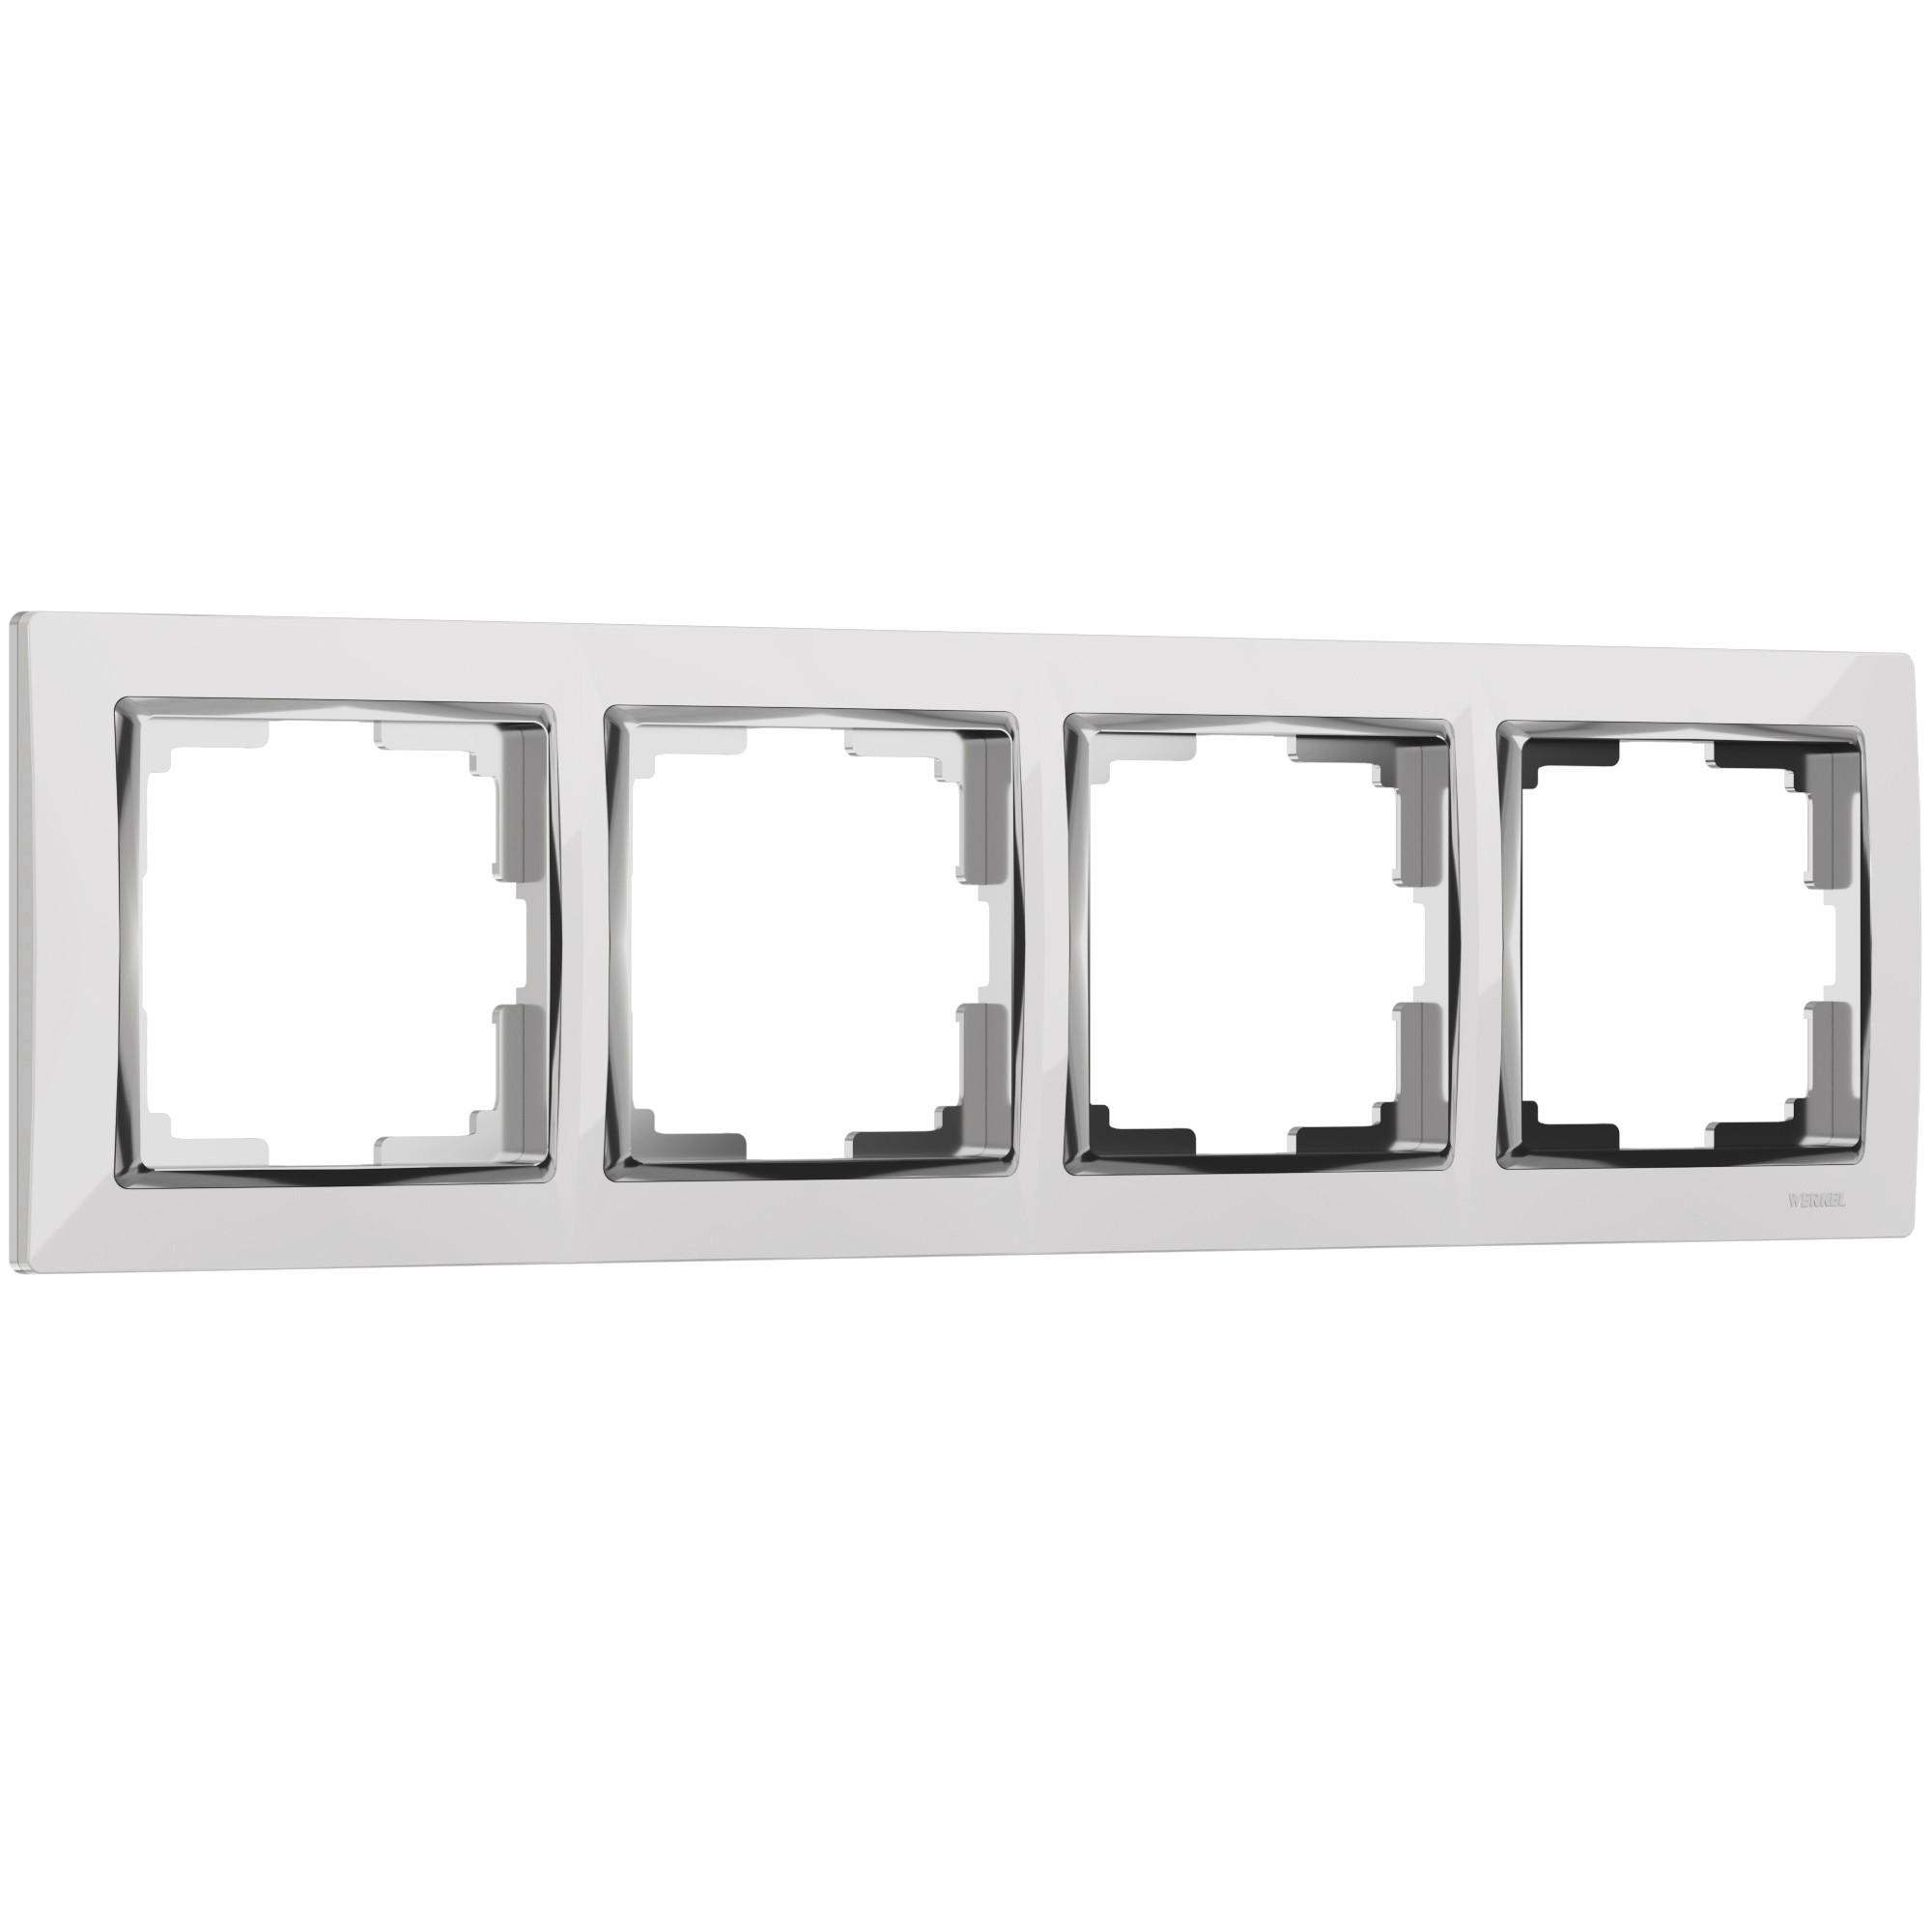 WL03-Frame-04-white /Рамка на 4 поста (белый/хром)